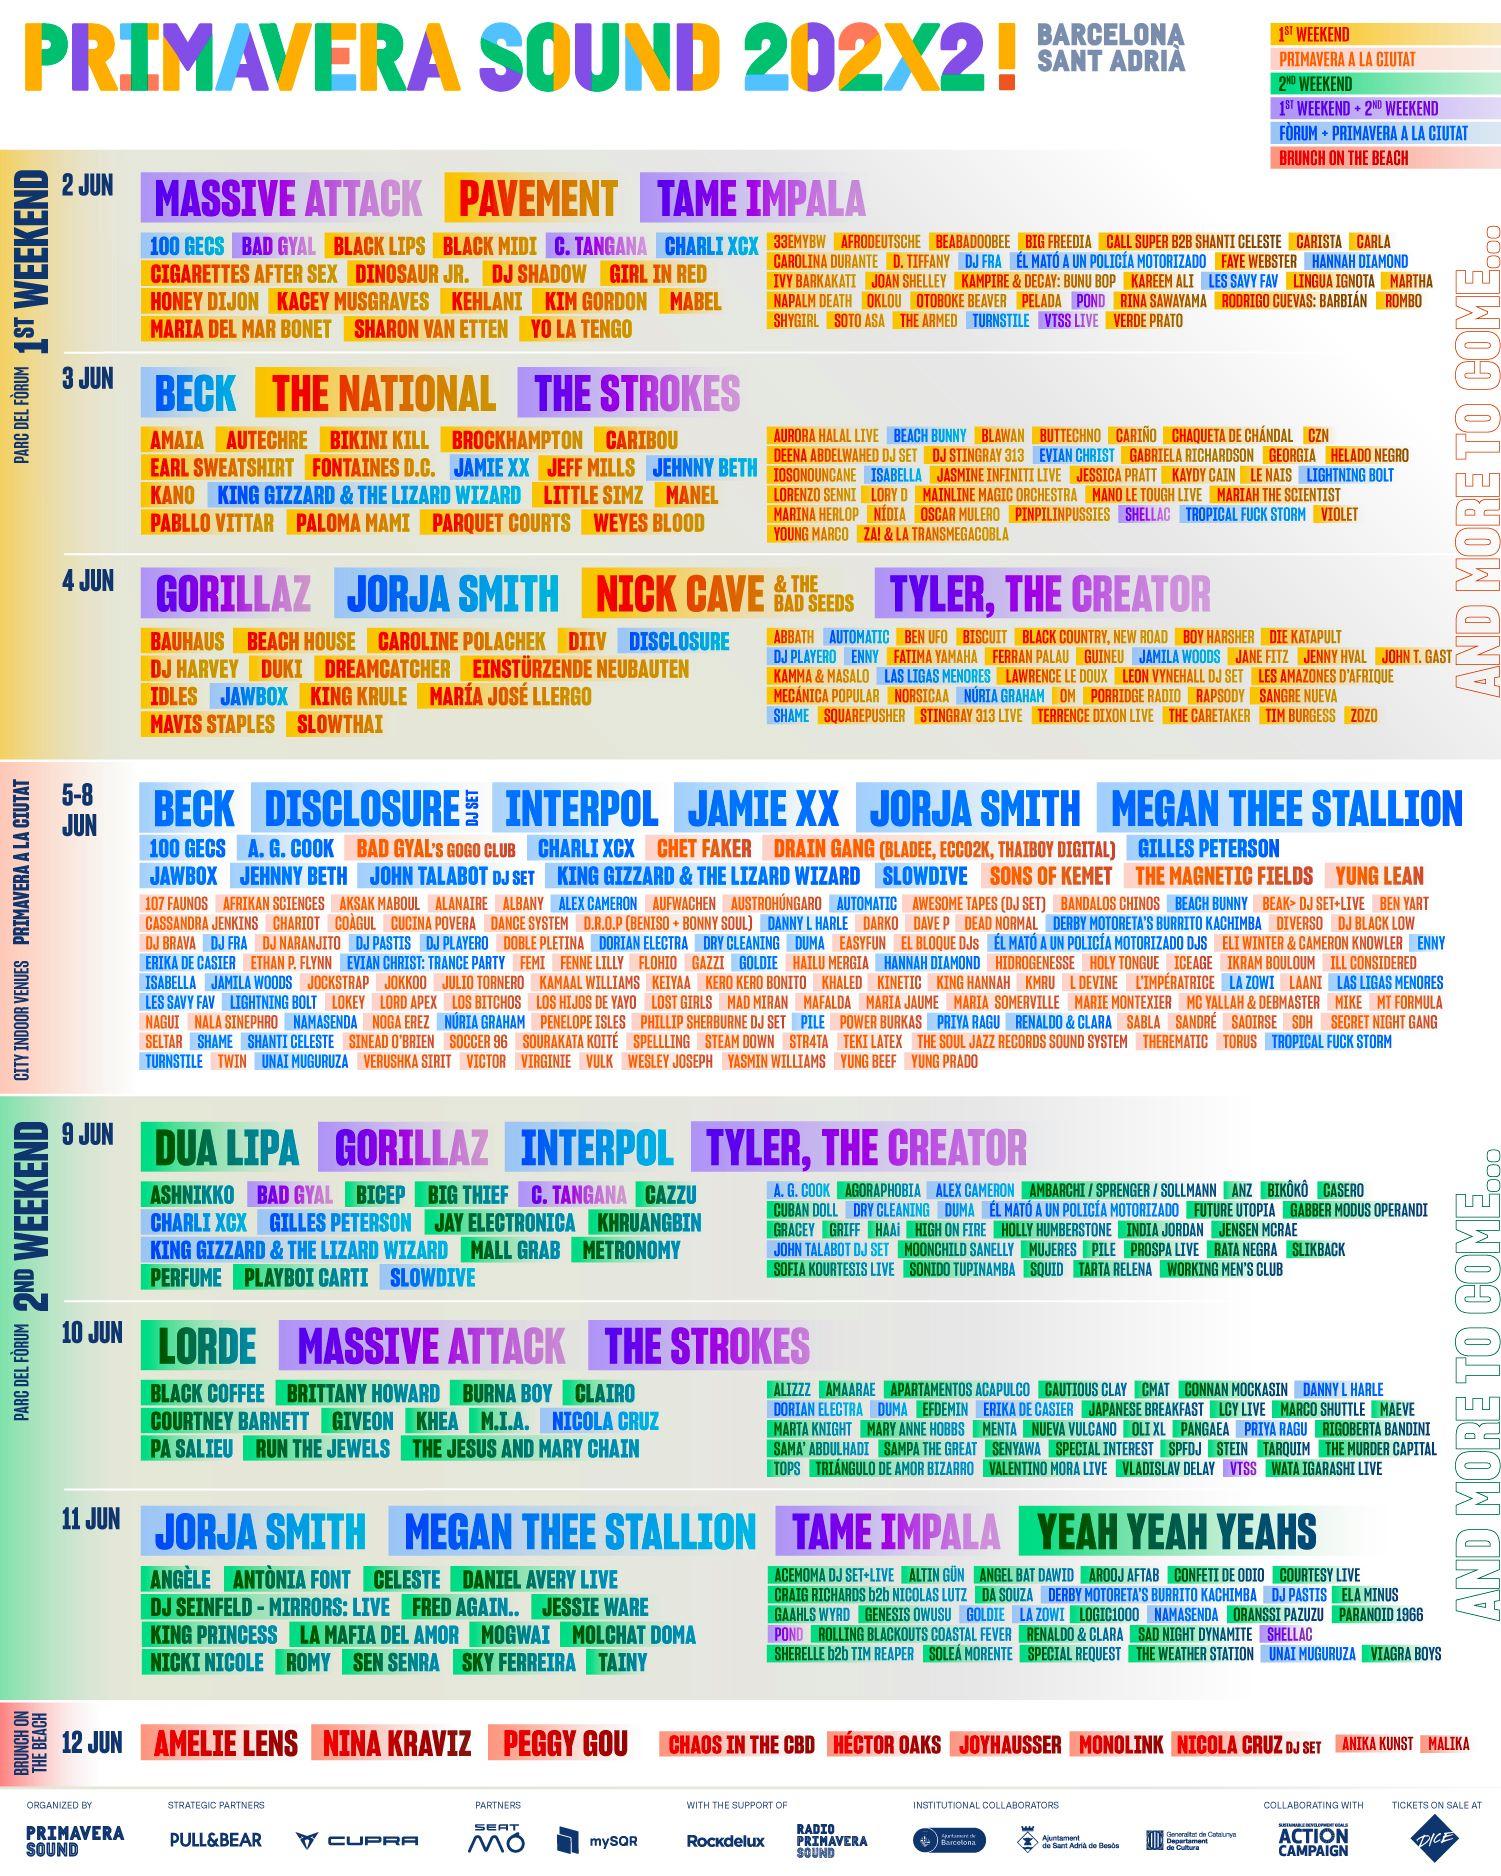 Cartel del Primavera Sound 2022